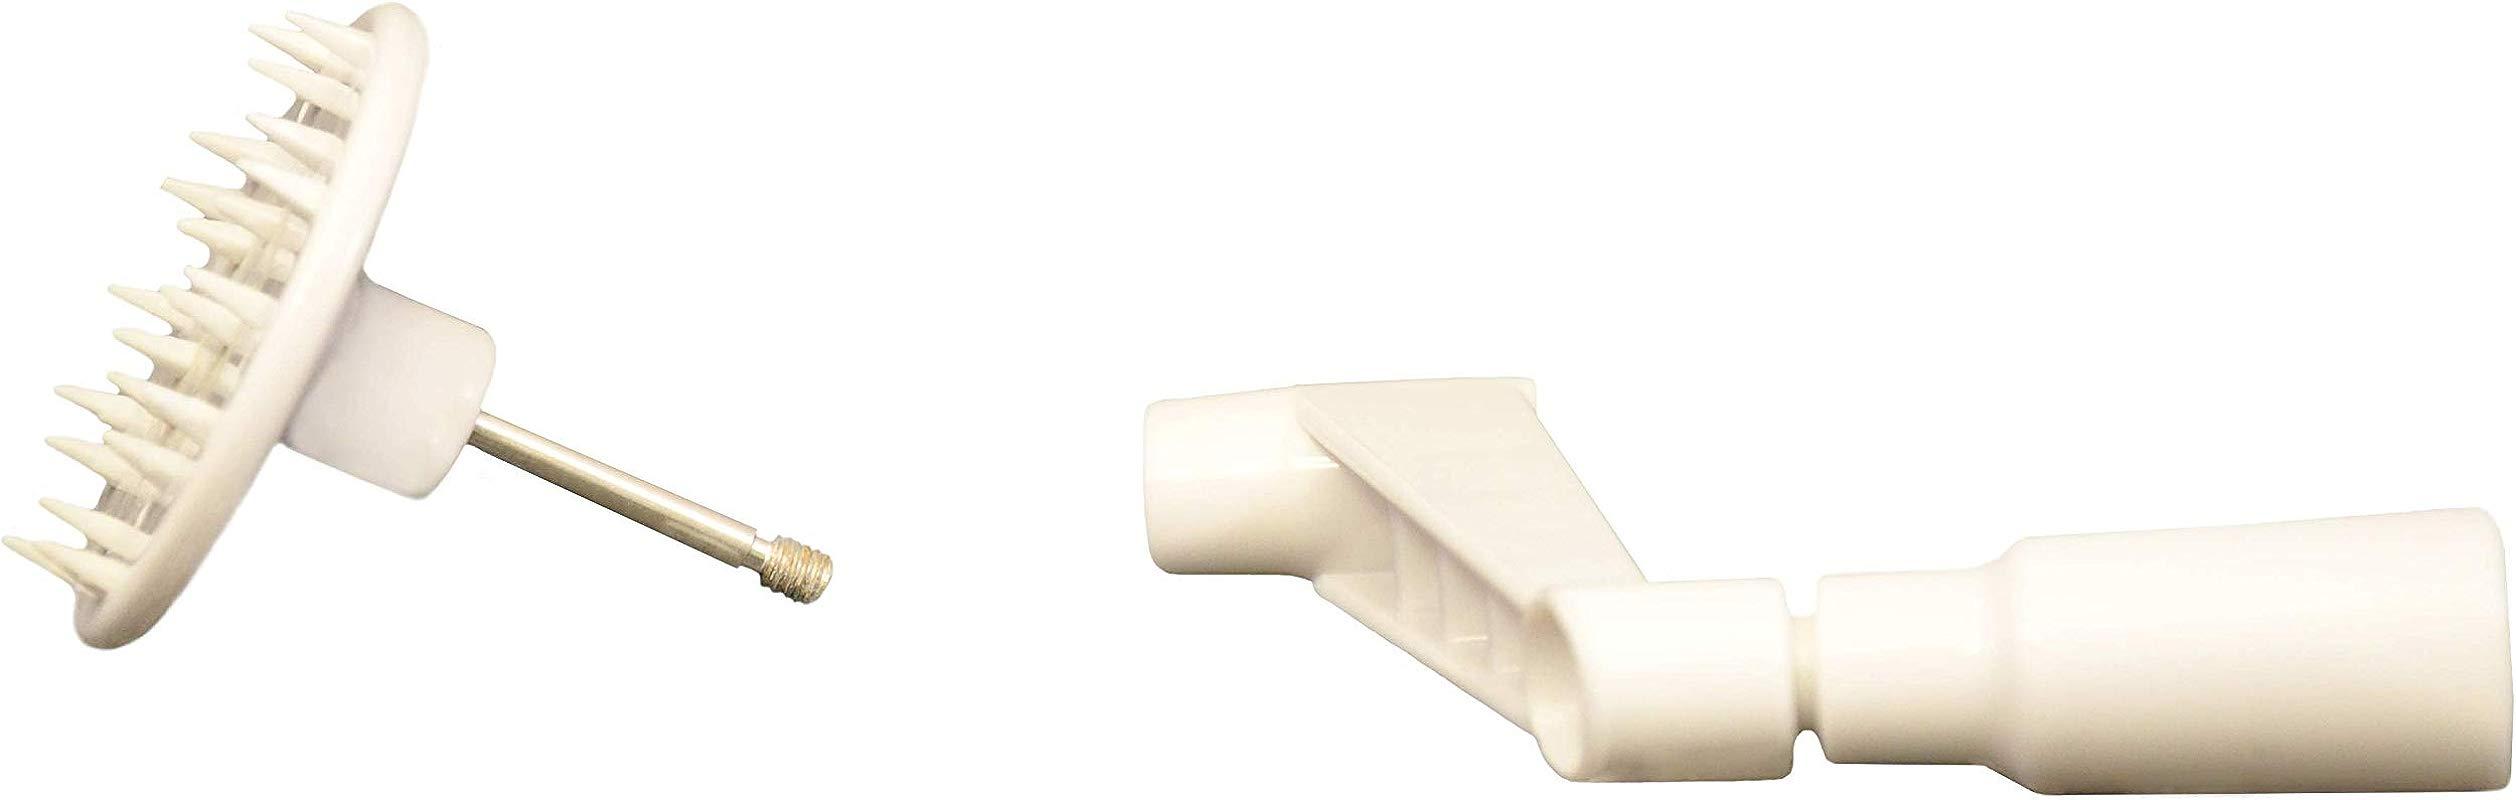 Brieftons Countertop Spiralizer Pack Of Turning Handle Vegetable Holder